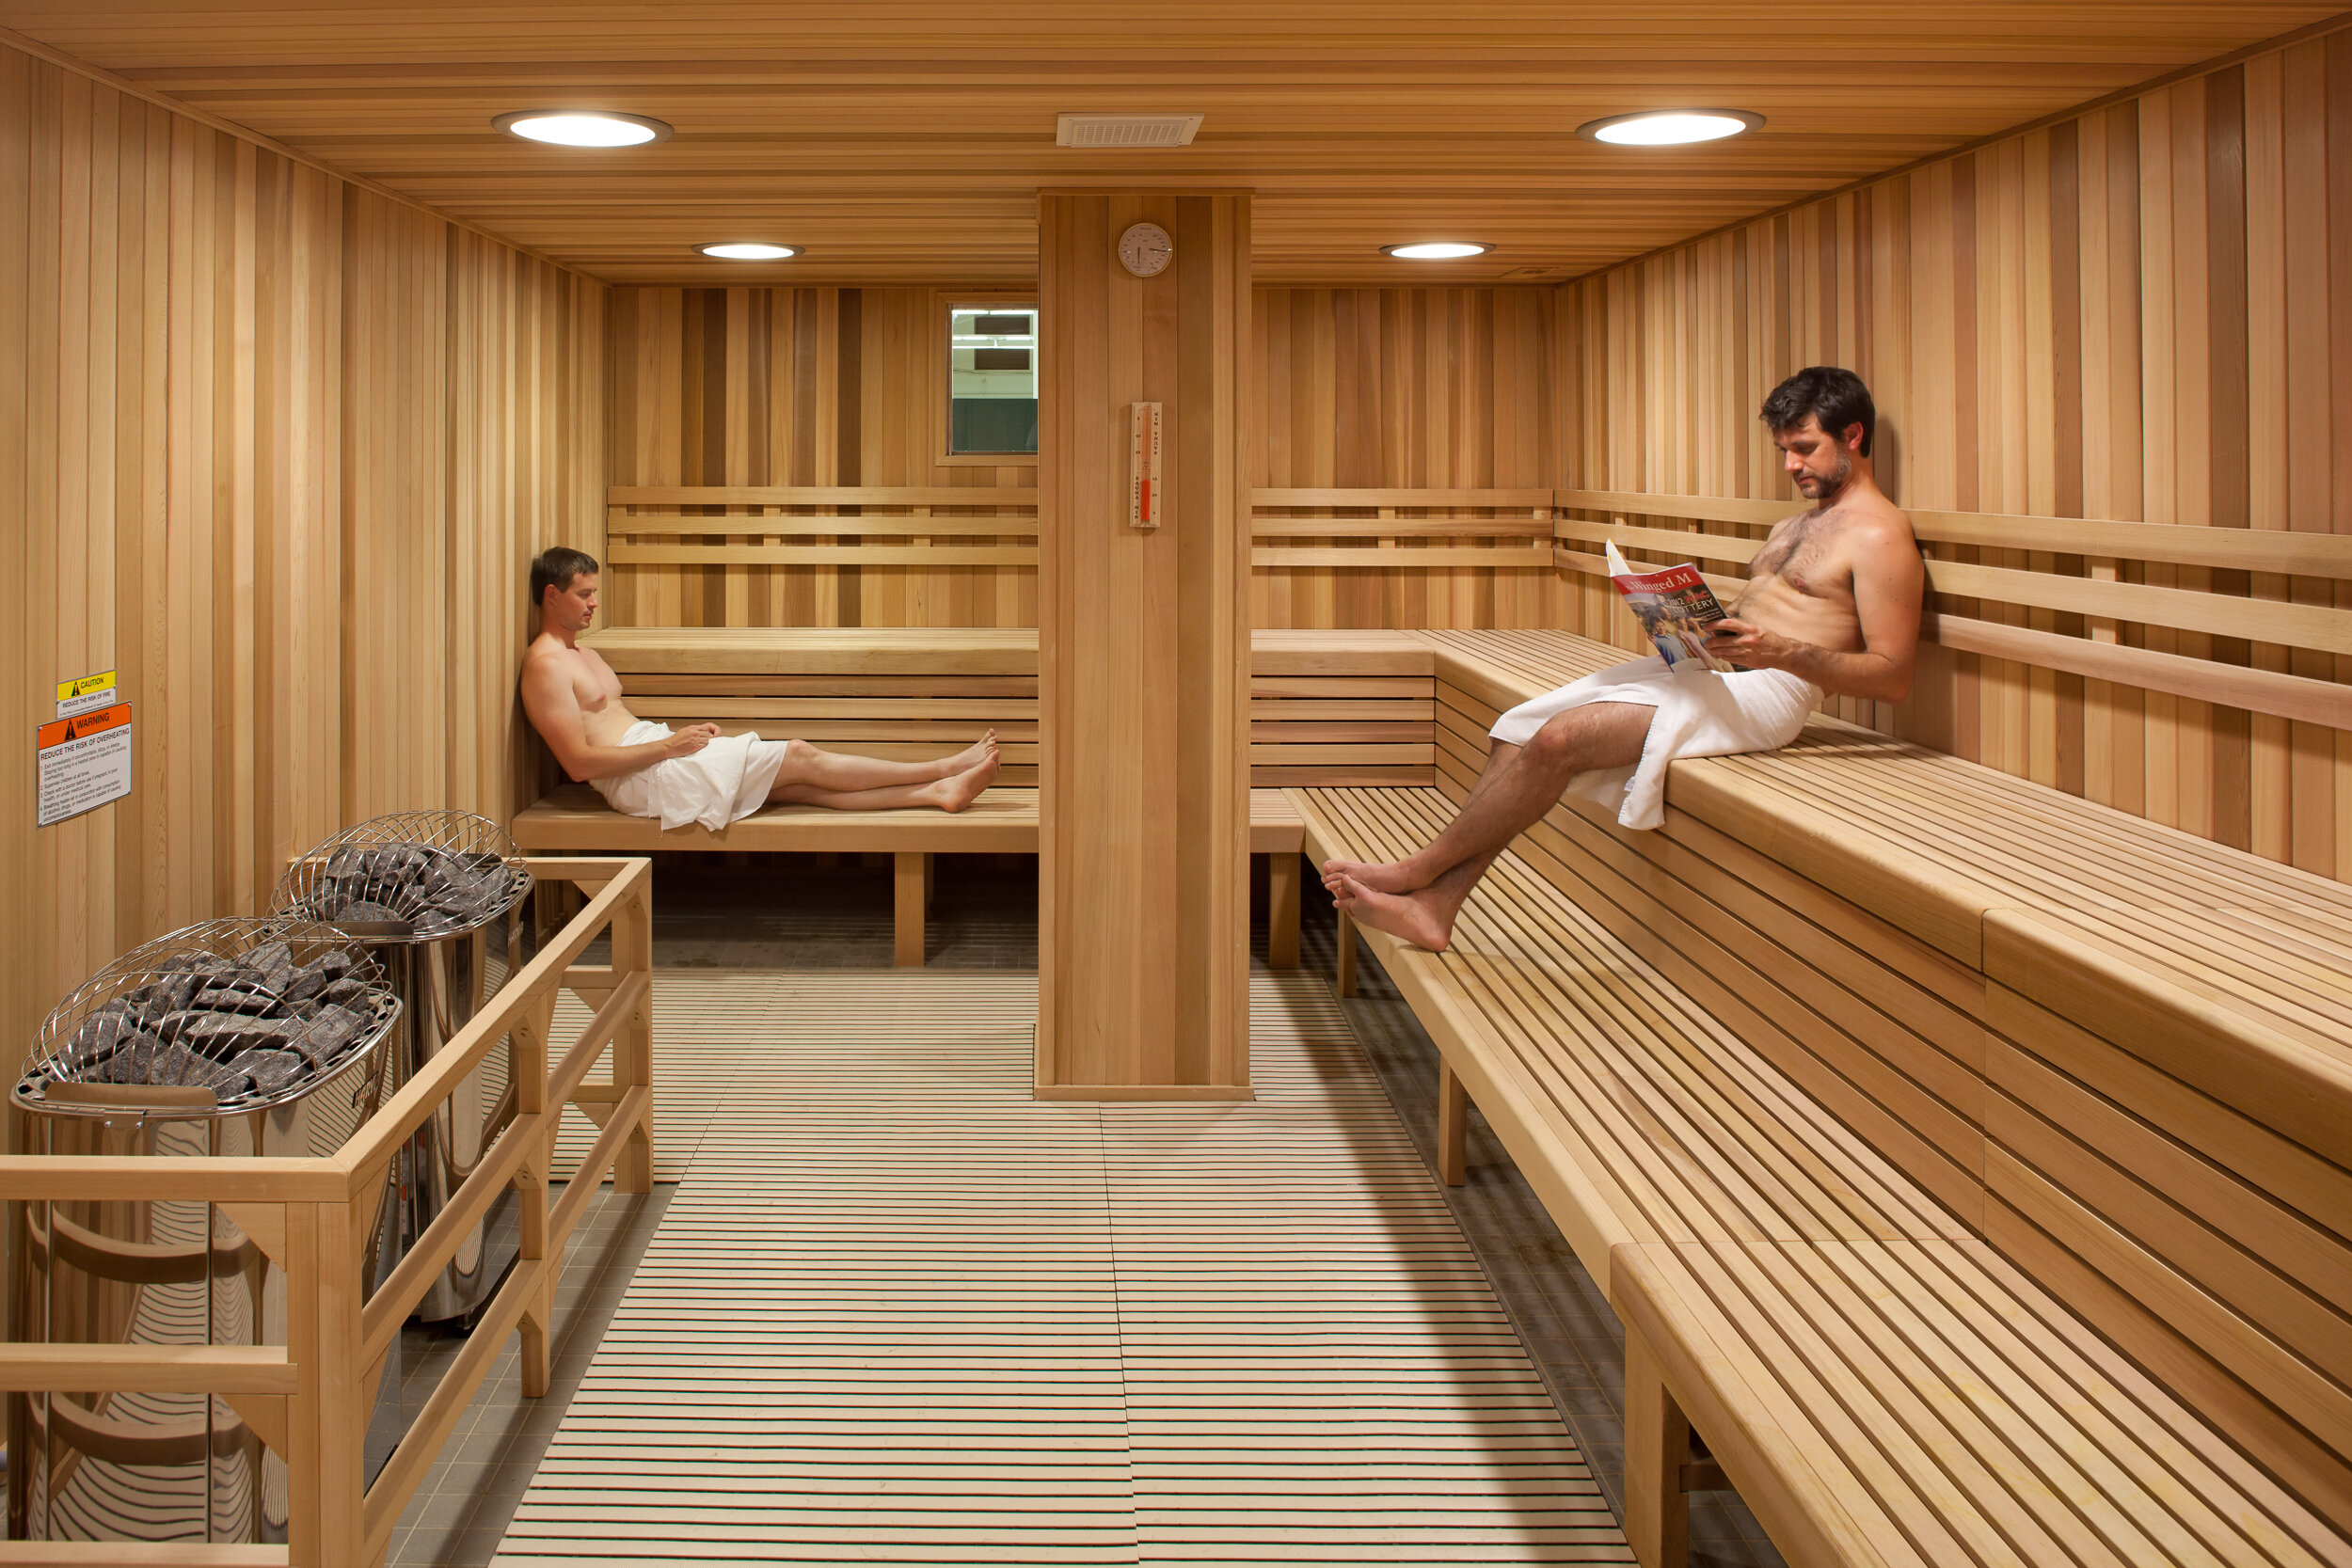 06-MAC-MensLR-JoshPartee-9337-sauna-people.jpg